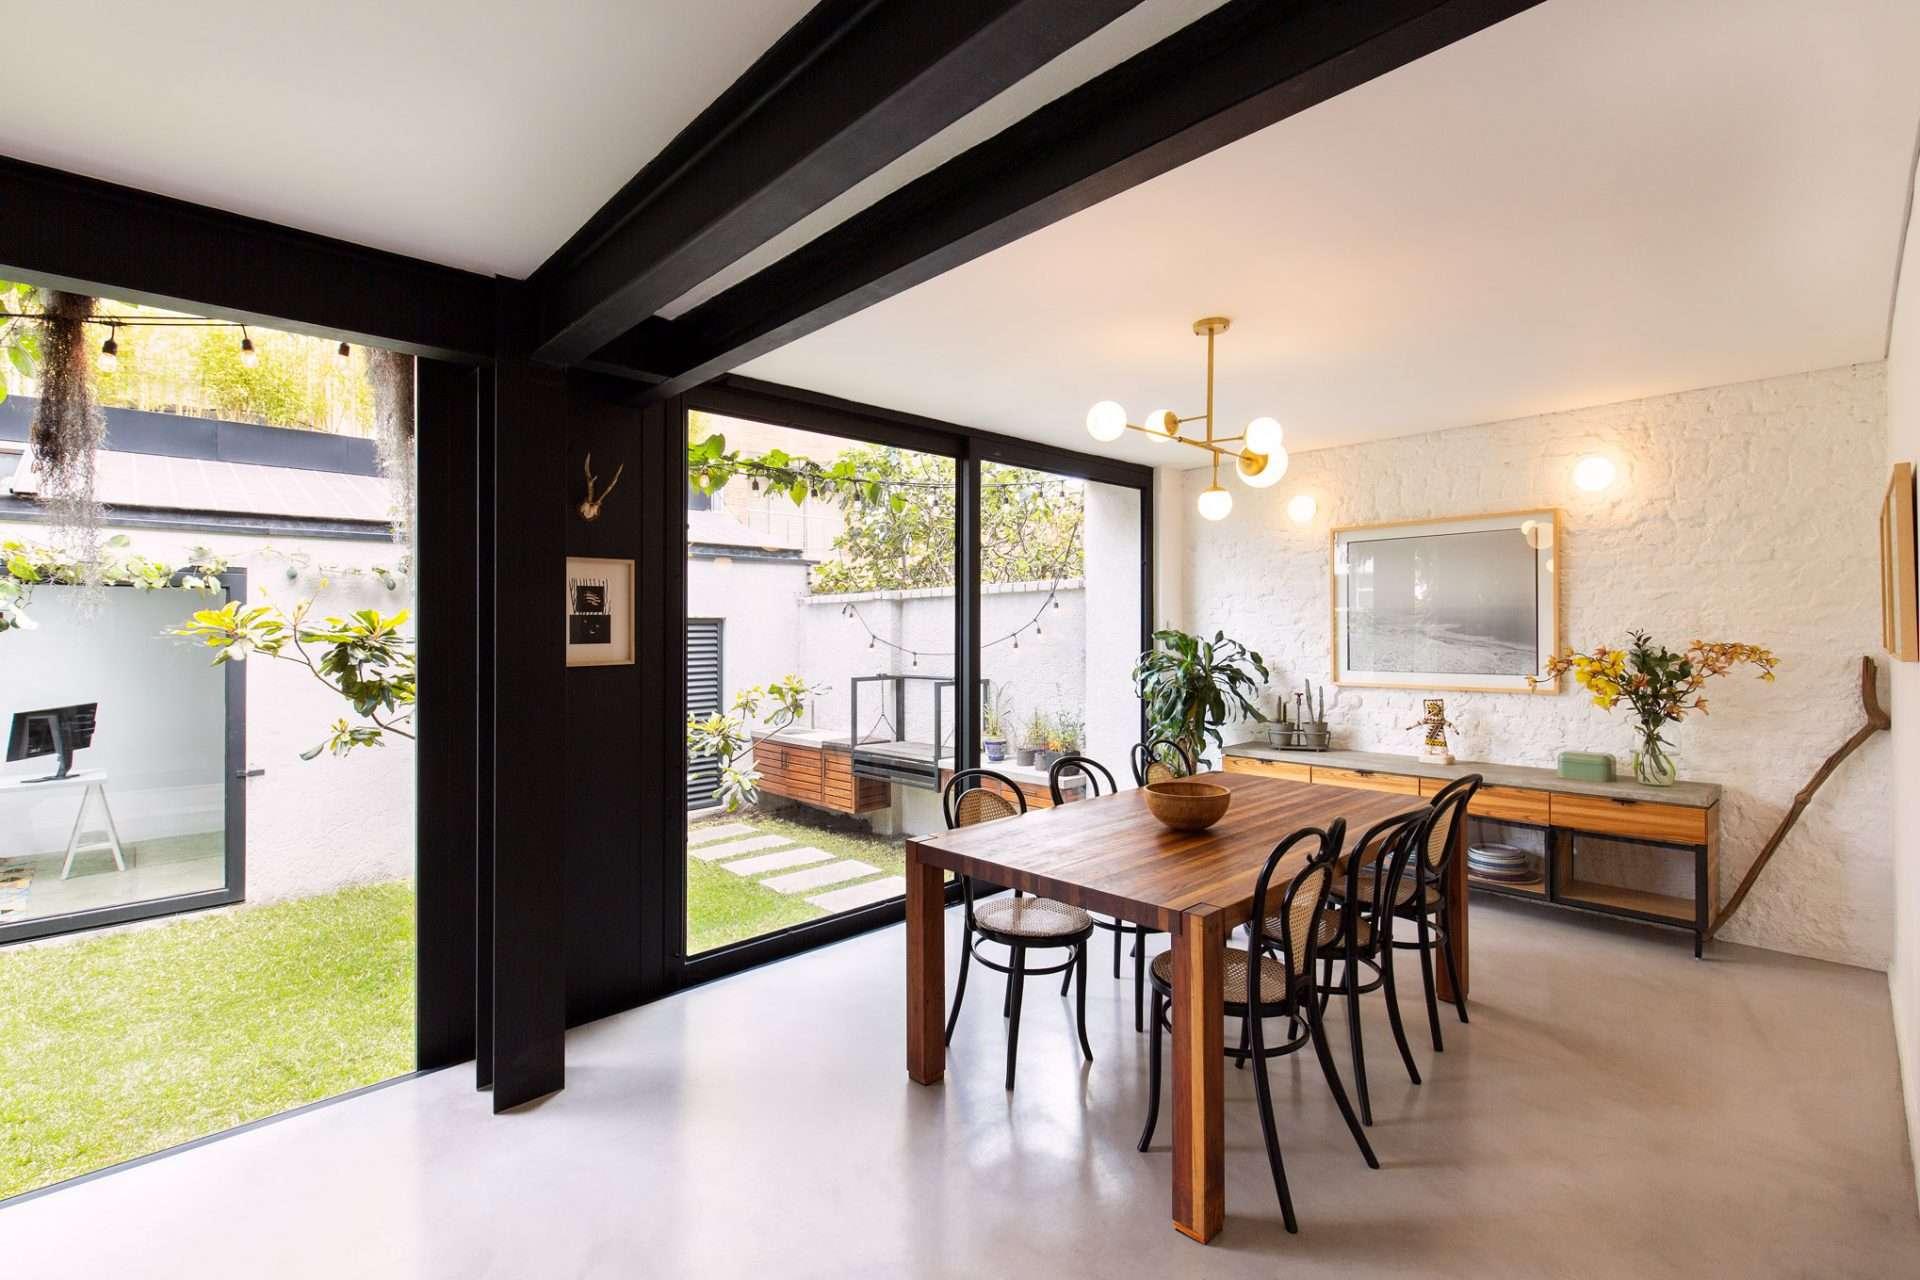 10.oberlaenderarquitectos.arquitectura.simonboschphotography.simon.bosch.bogota.interior.habitar